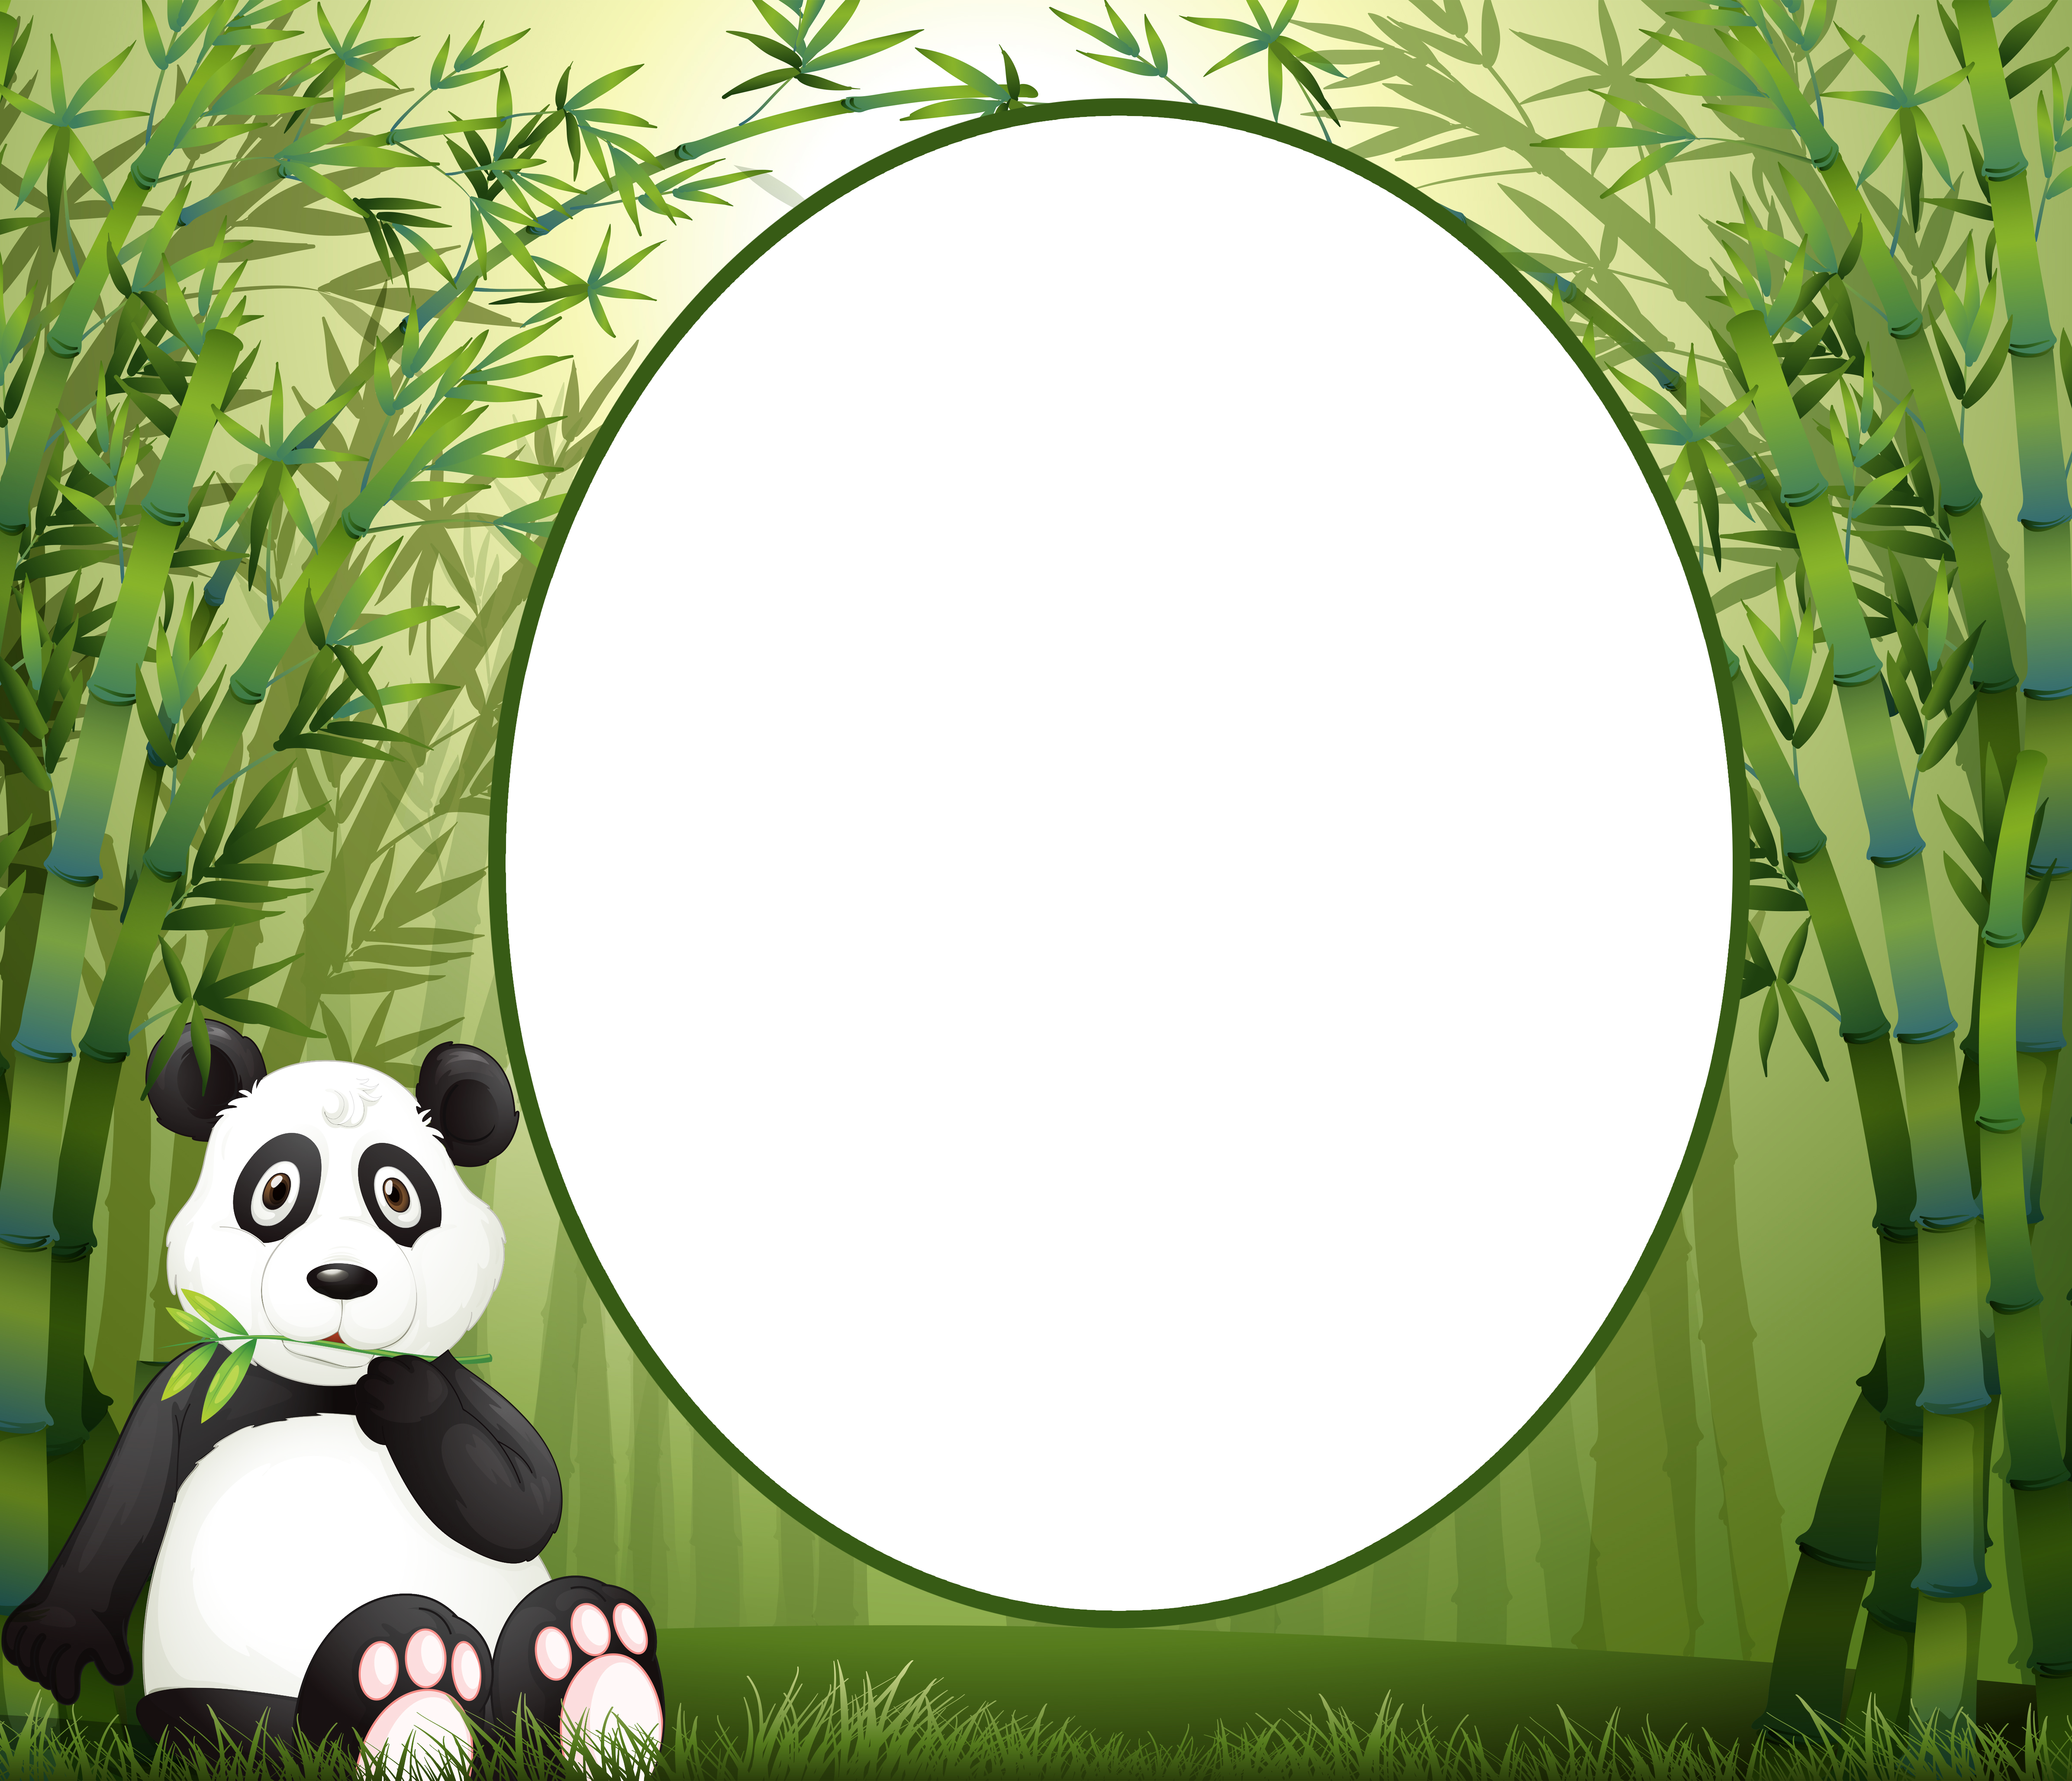 Panda clipart frame #13